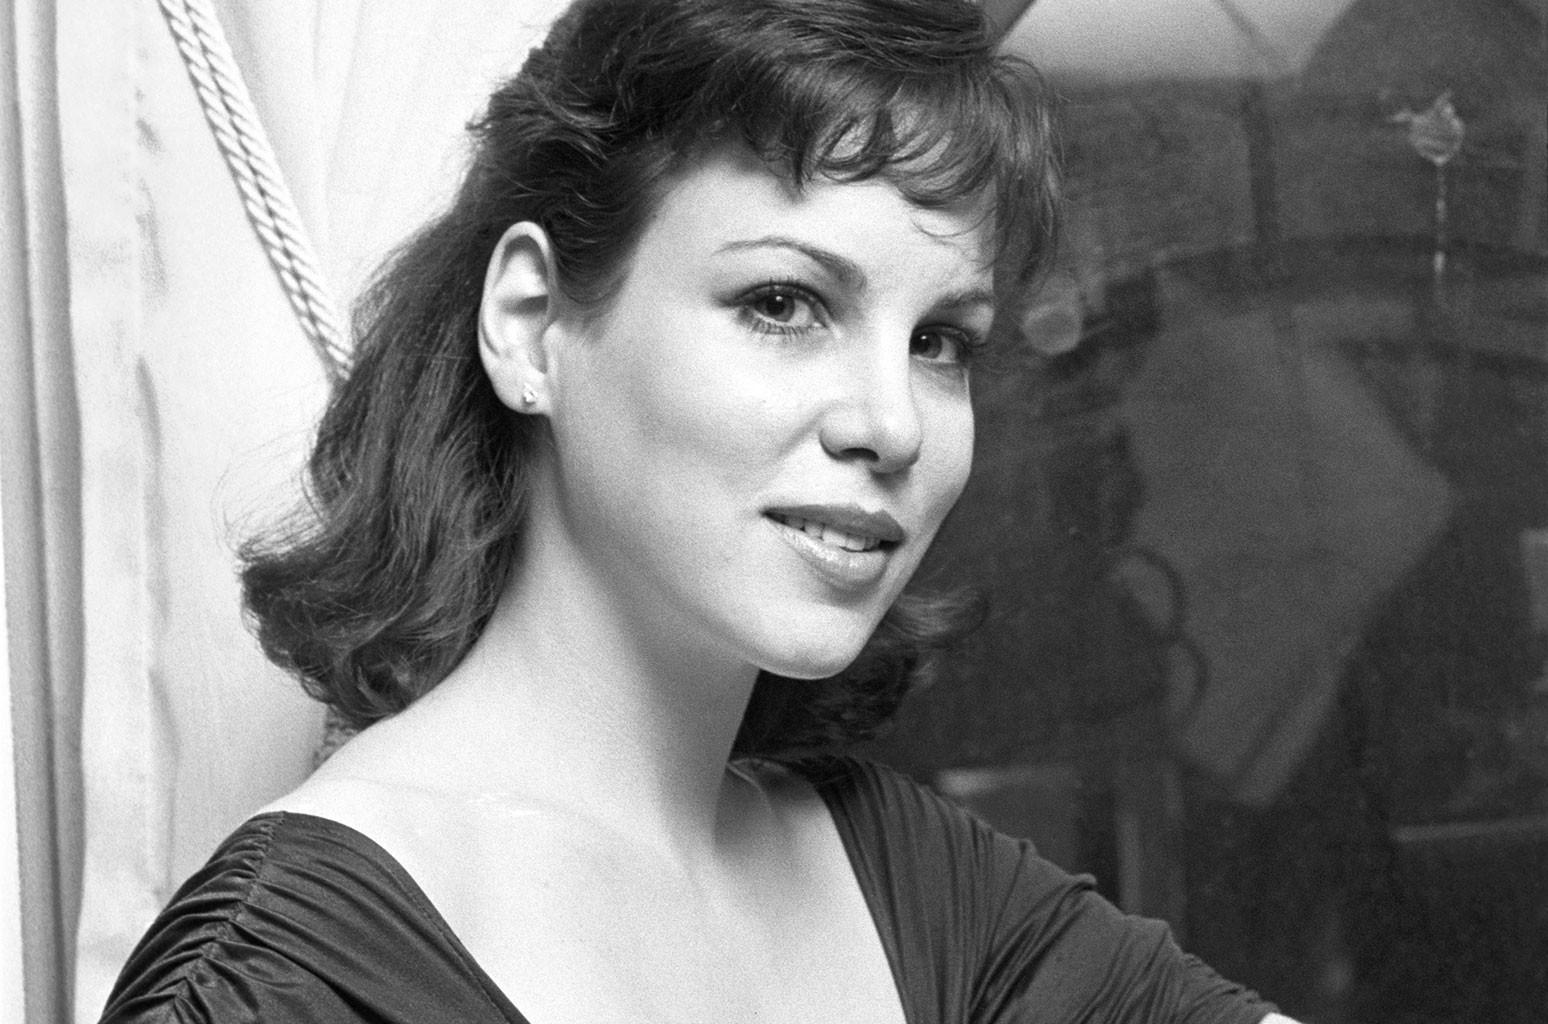 Cristina Monet-Zilkha